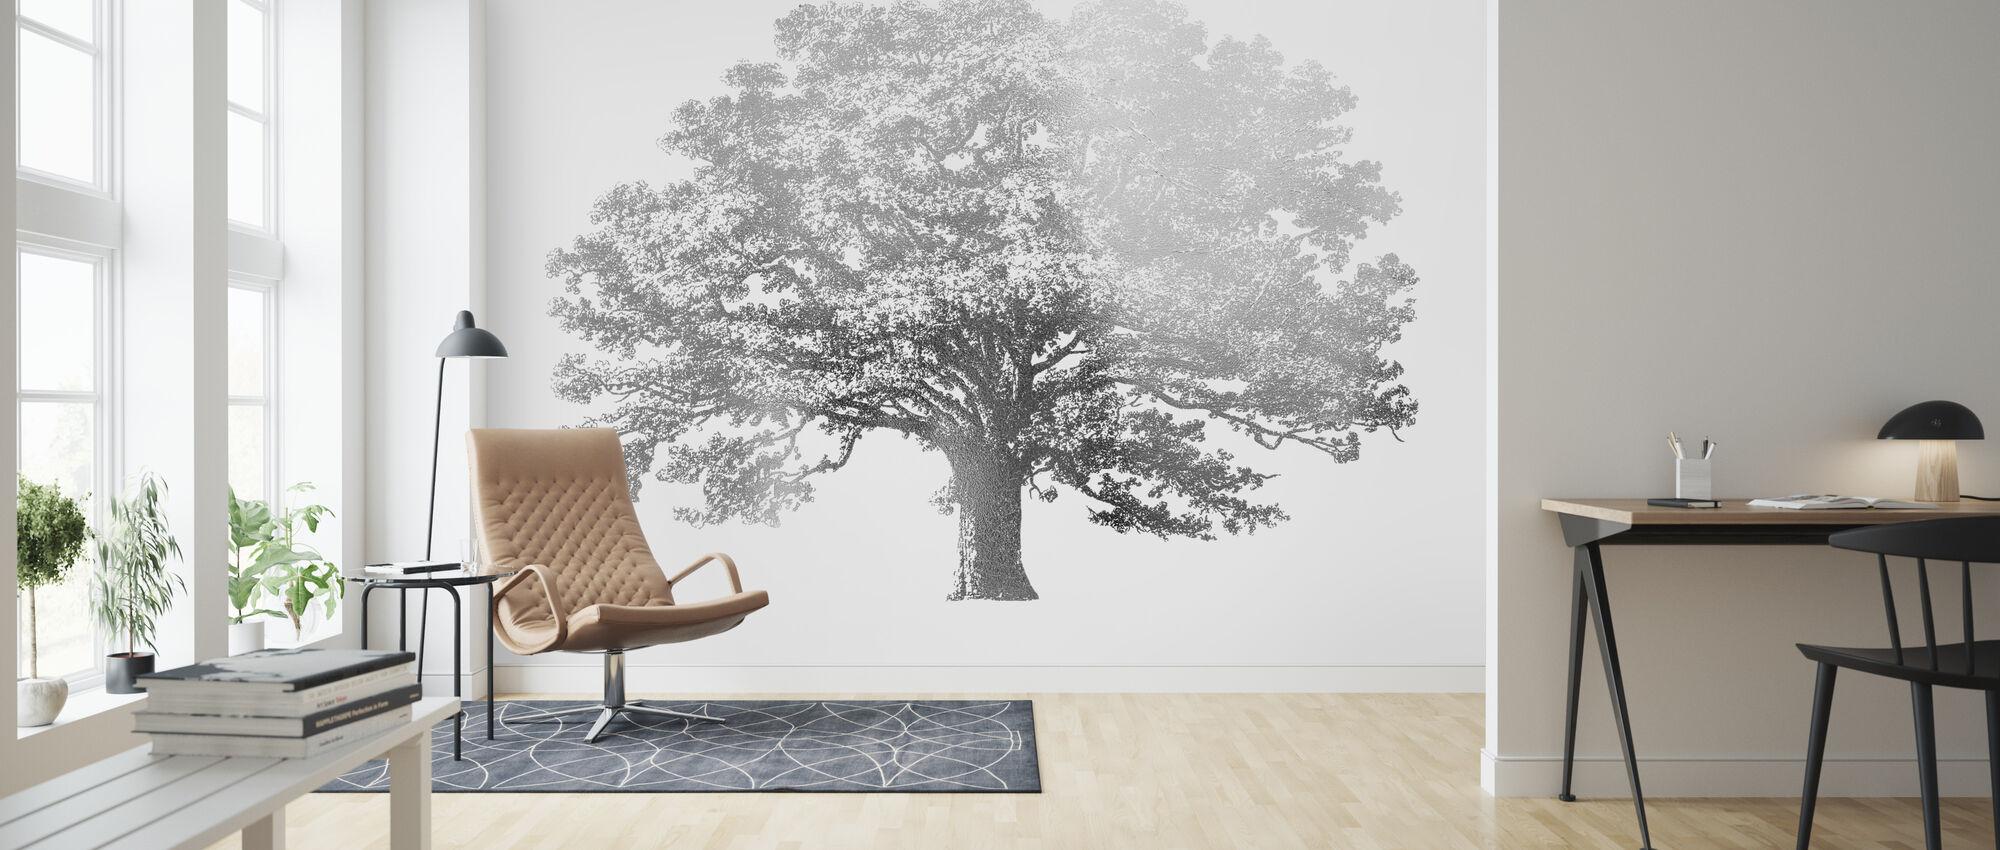 Elephant Tree - Wallpaper - Living Room